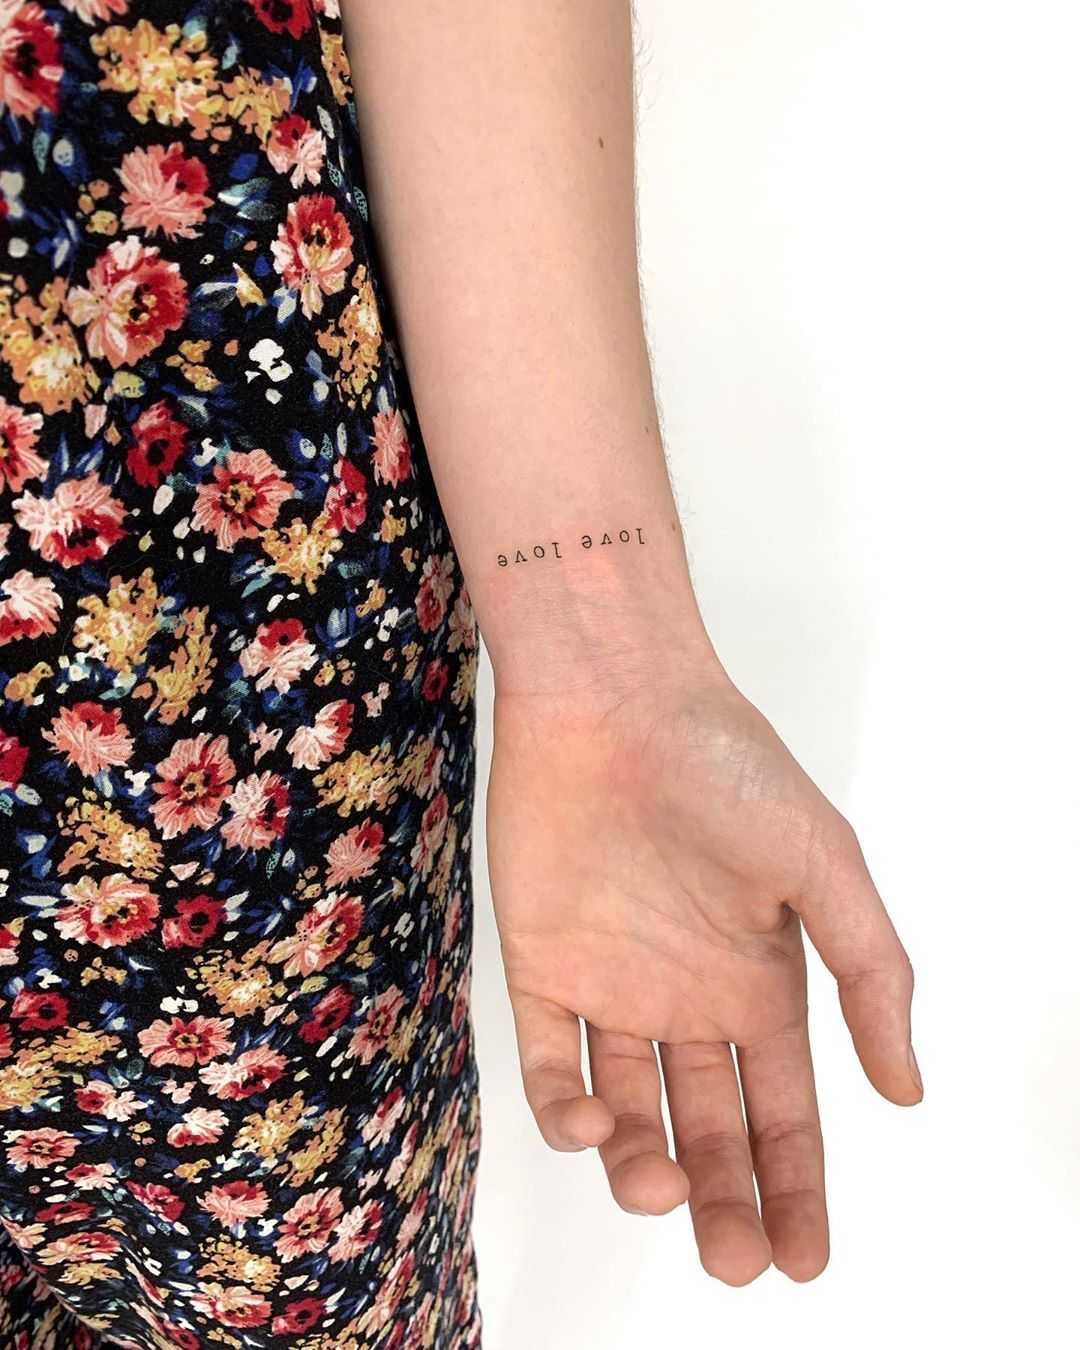 Love love tattoo by Gianina Caputo